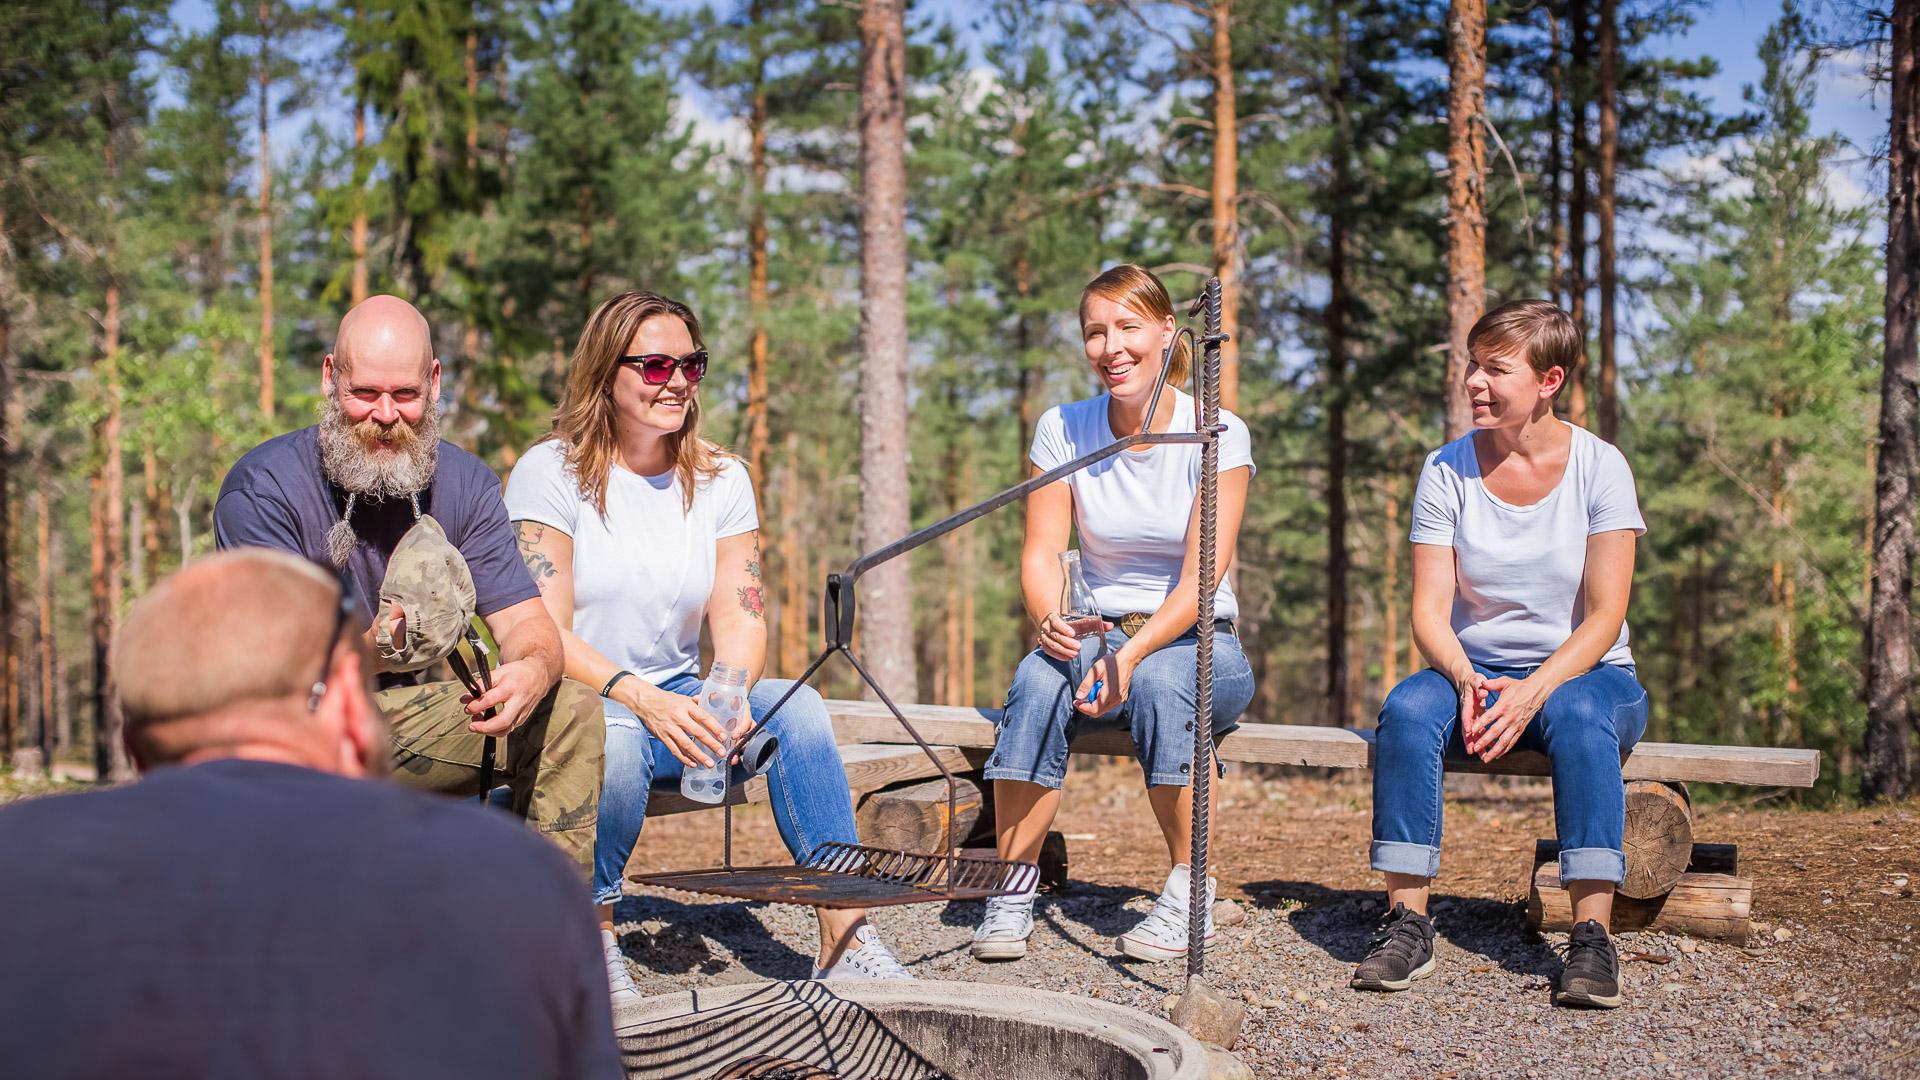 Visit Tampere Korsuretket Patikointi Lunch Picnic Nature Hiking Laura Vanzo 3